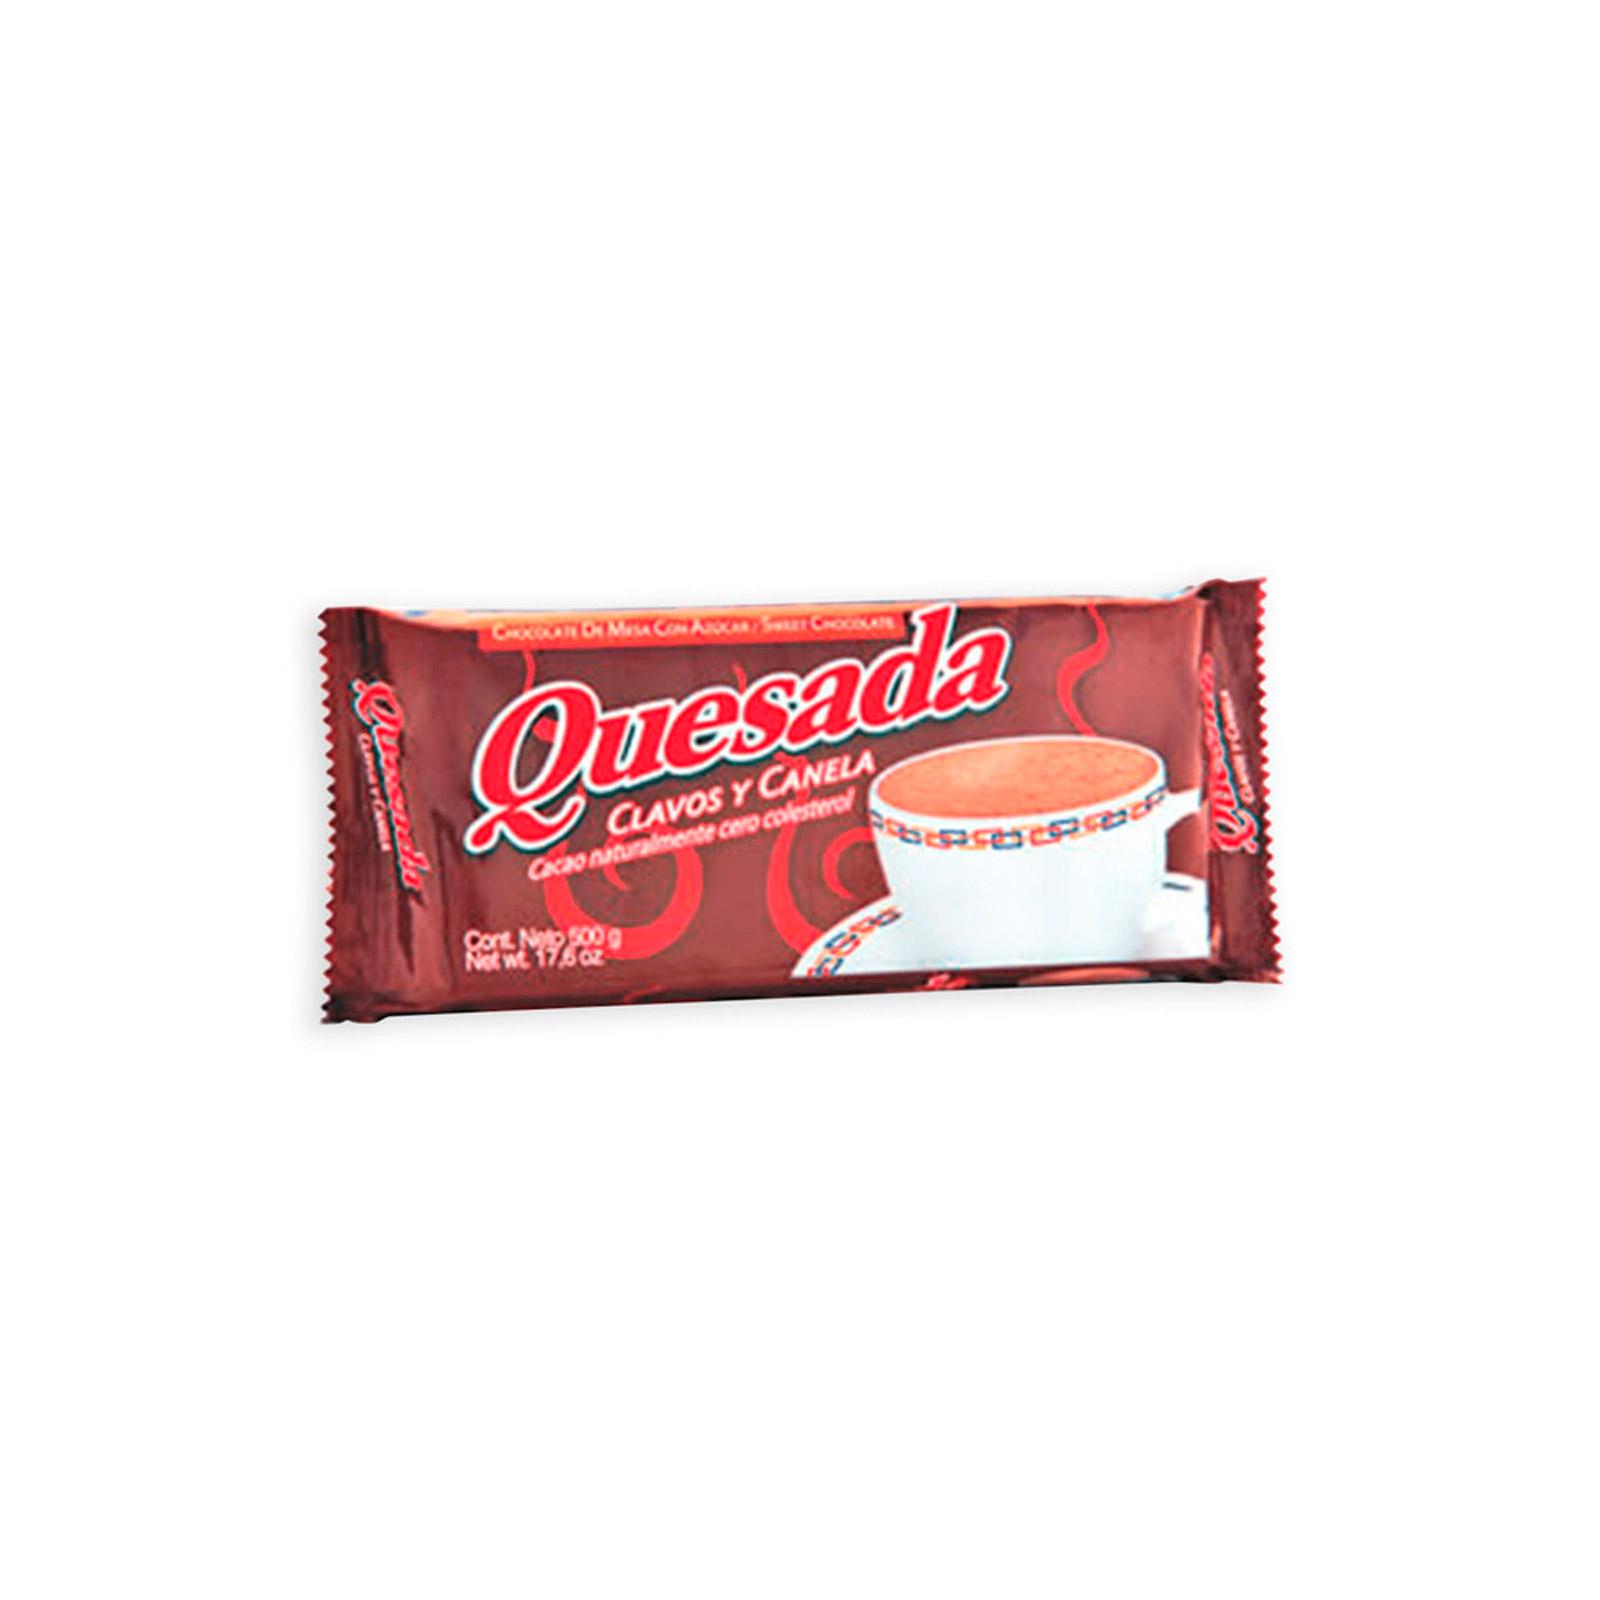 Chocolate Quesada